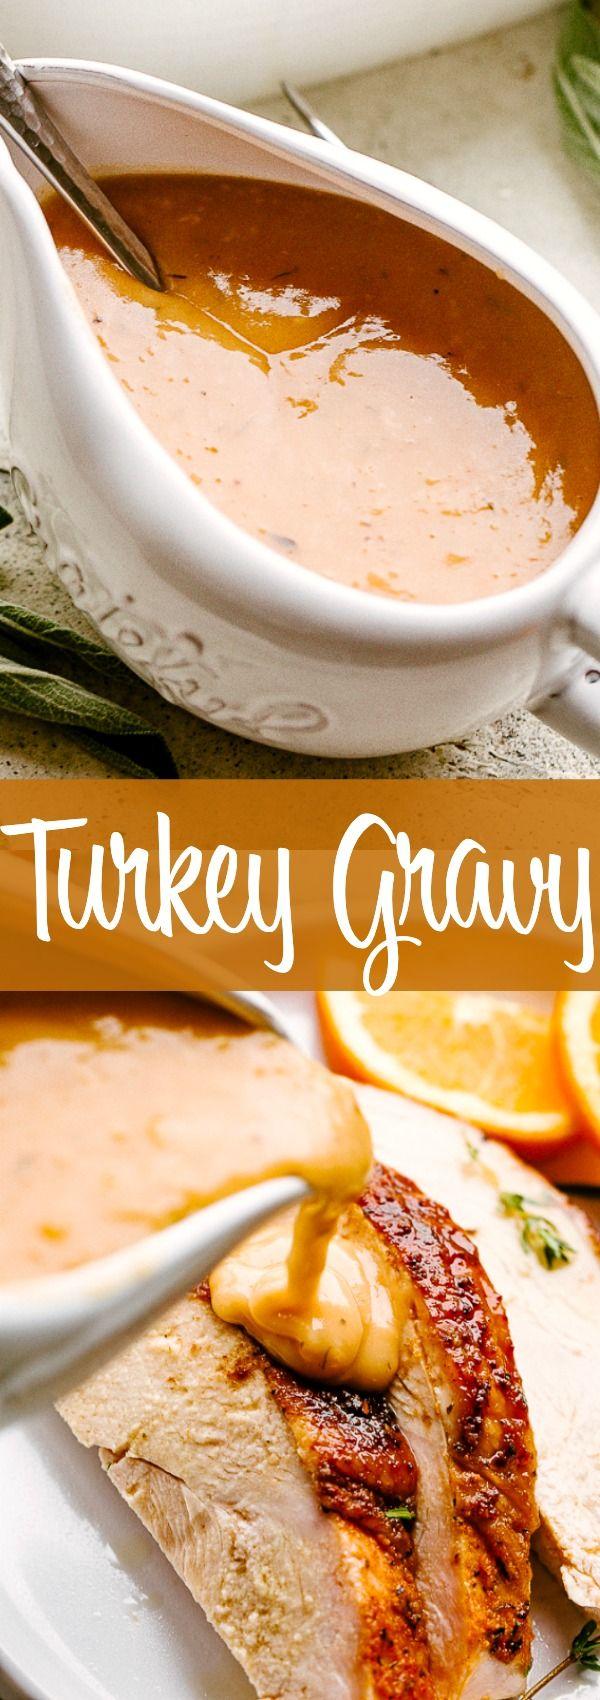 How To Make Gravy From Turkey Drippings In Pan  colourhaze.de